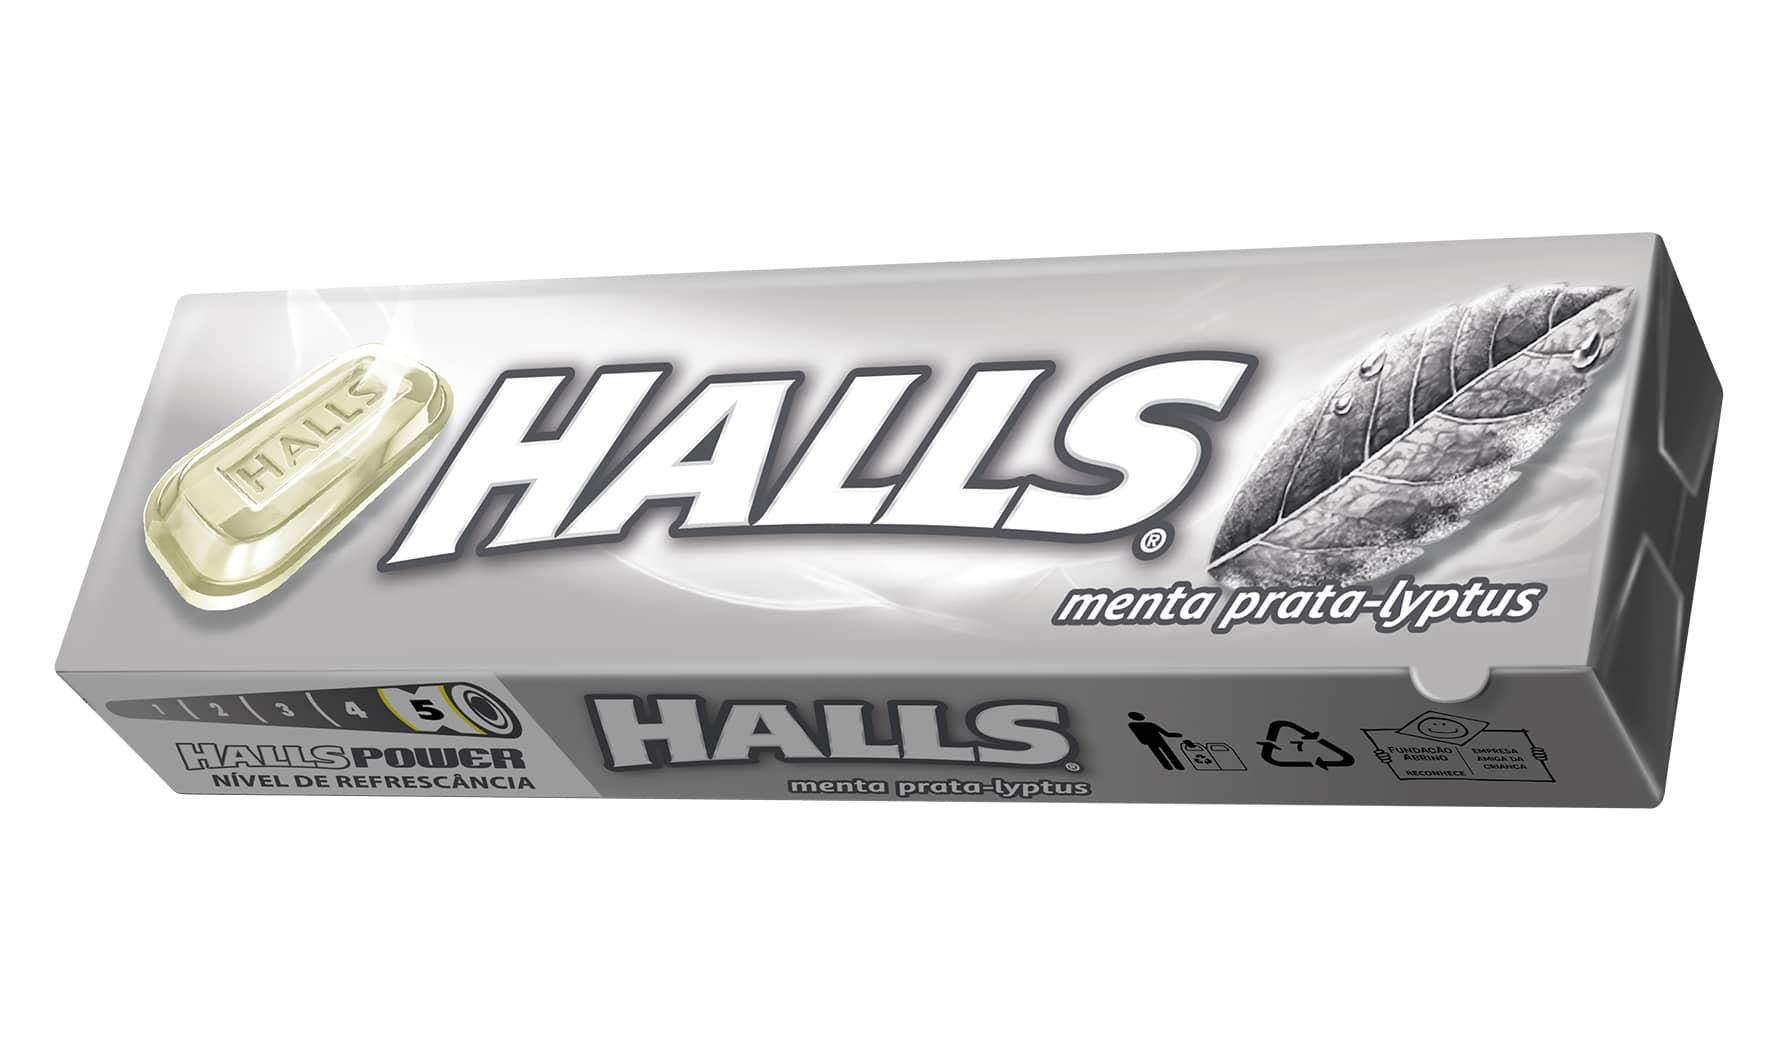 HALLS_PRATA